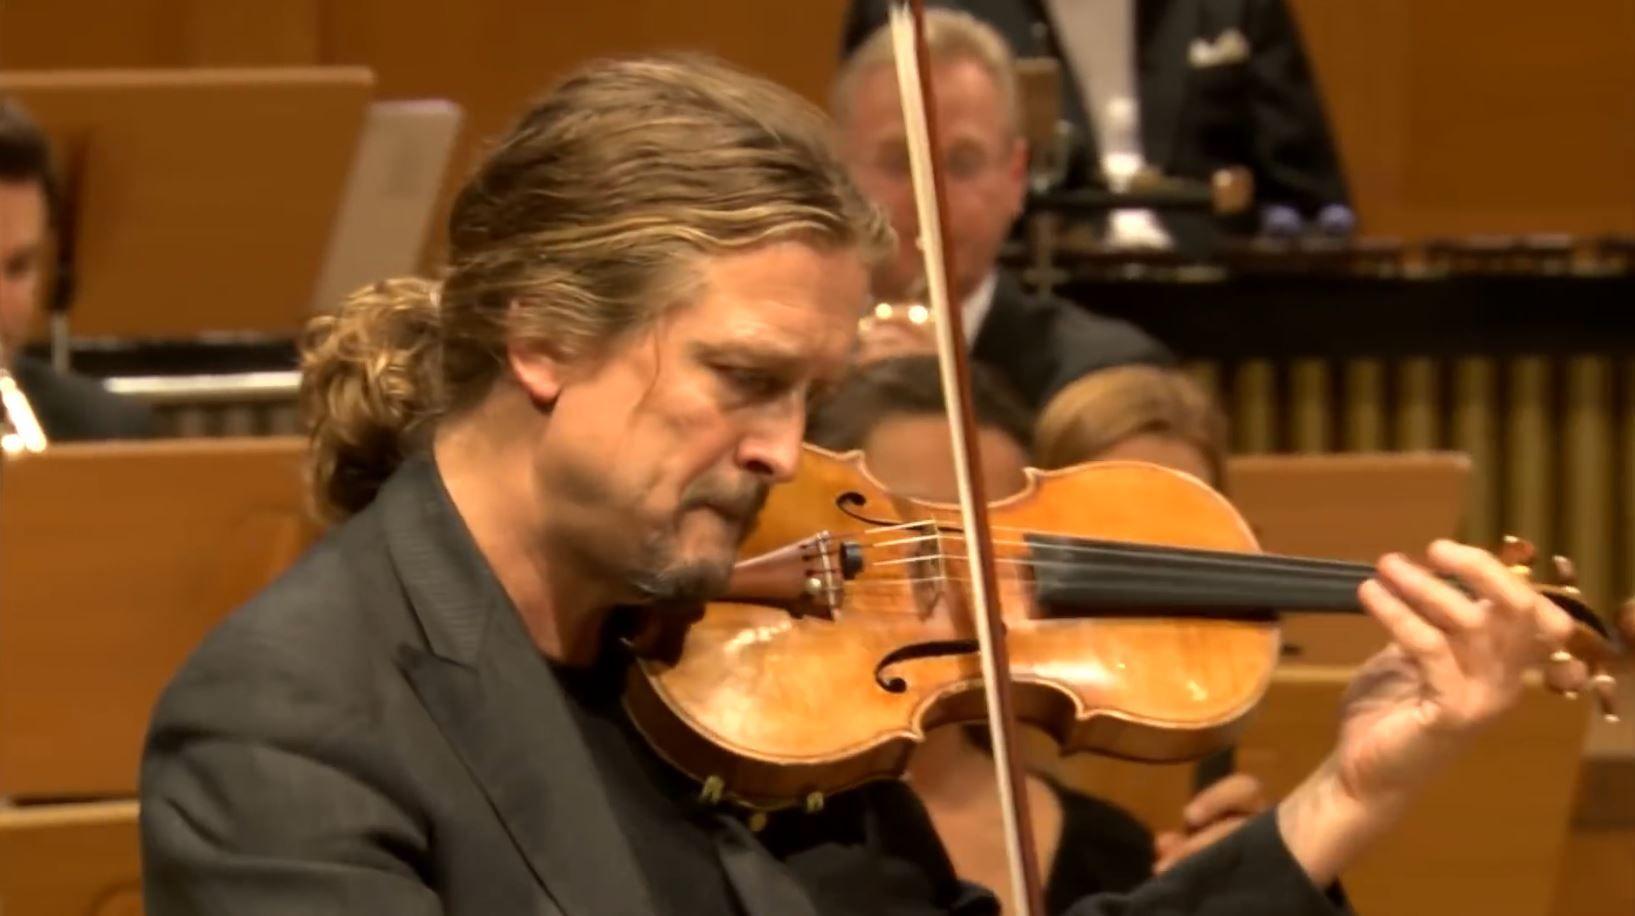 Gyorgy Ligeti Violin Concerto Christian Tetzlaff Gurzenich Orchester Koln Francois Xavier Roth Classical Music Violin Concert